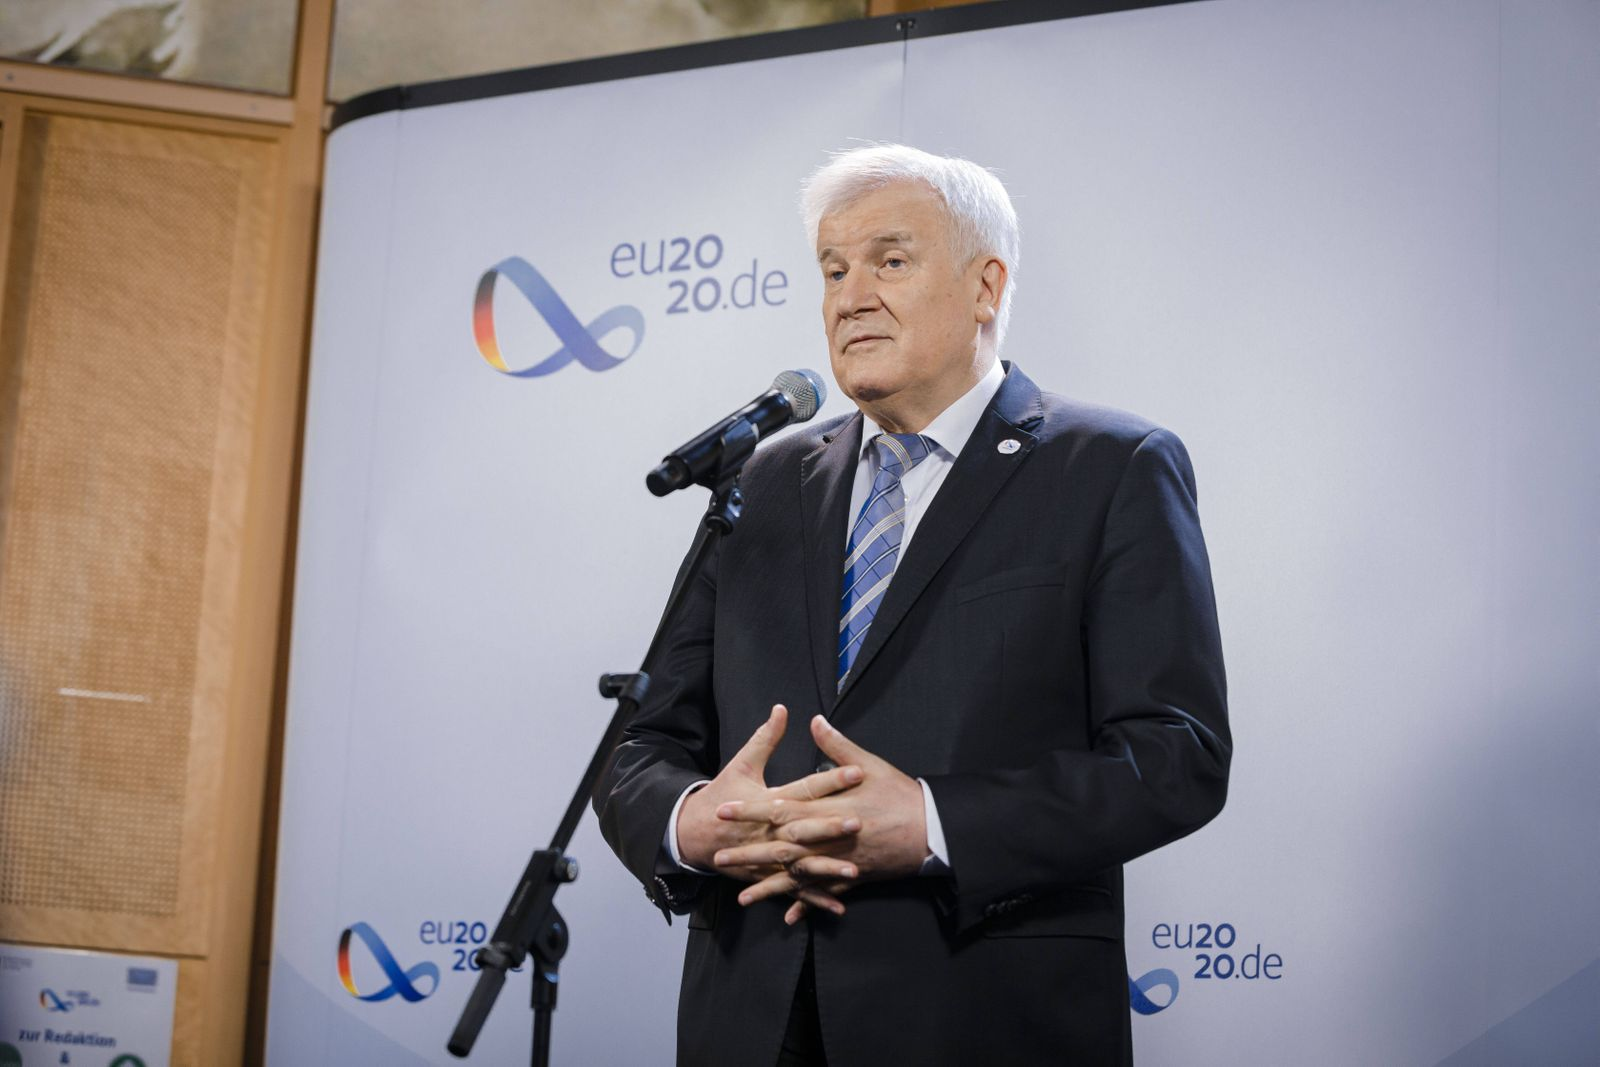 Informelles Treffen der EU Innenminister. Bundesinnenminister Horst Seehofer, CSU, gibt vor Beginn der Sitzung im Bunde